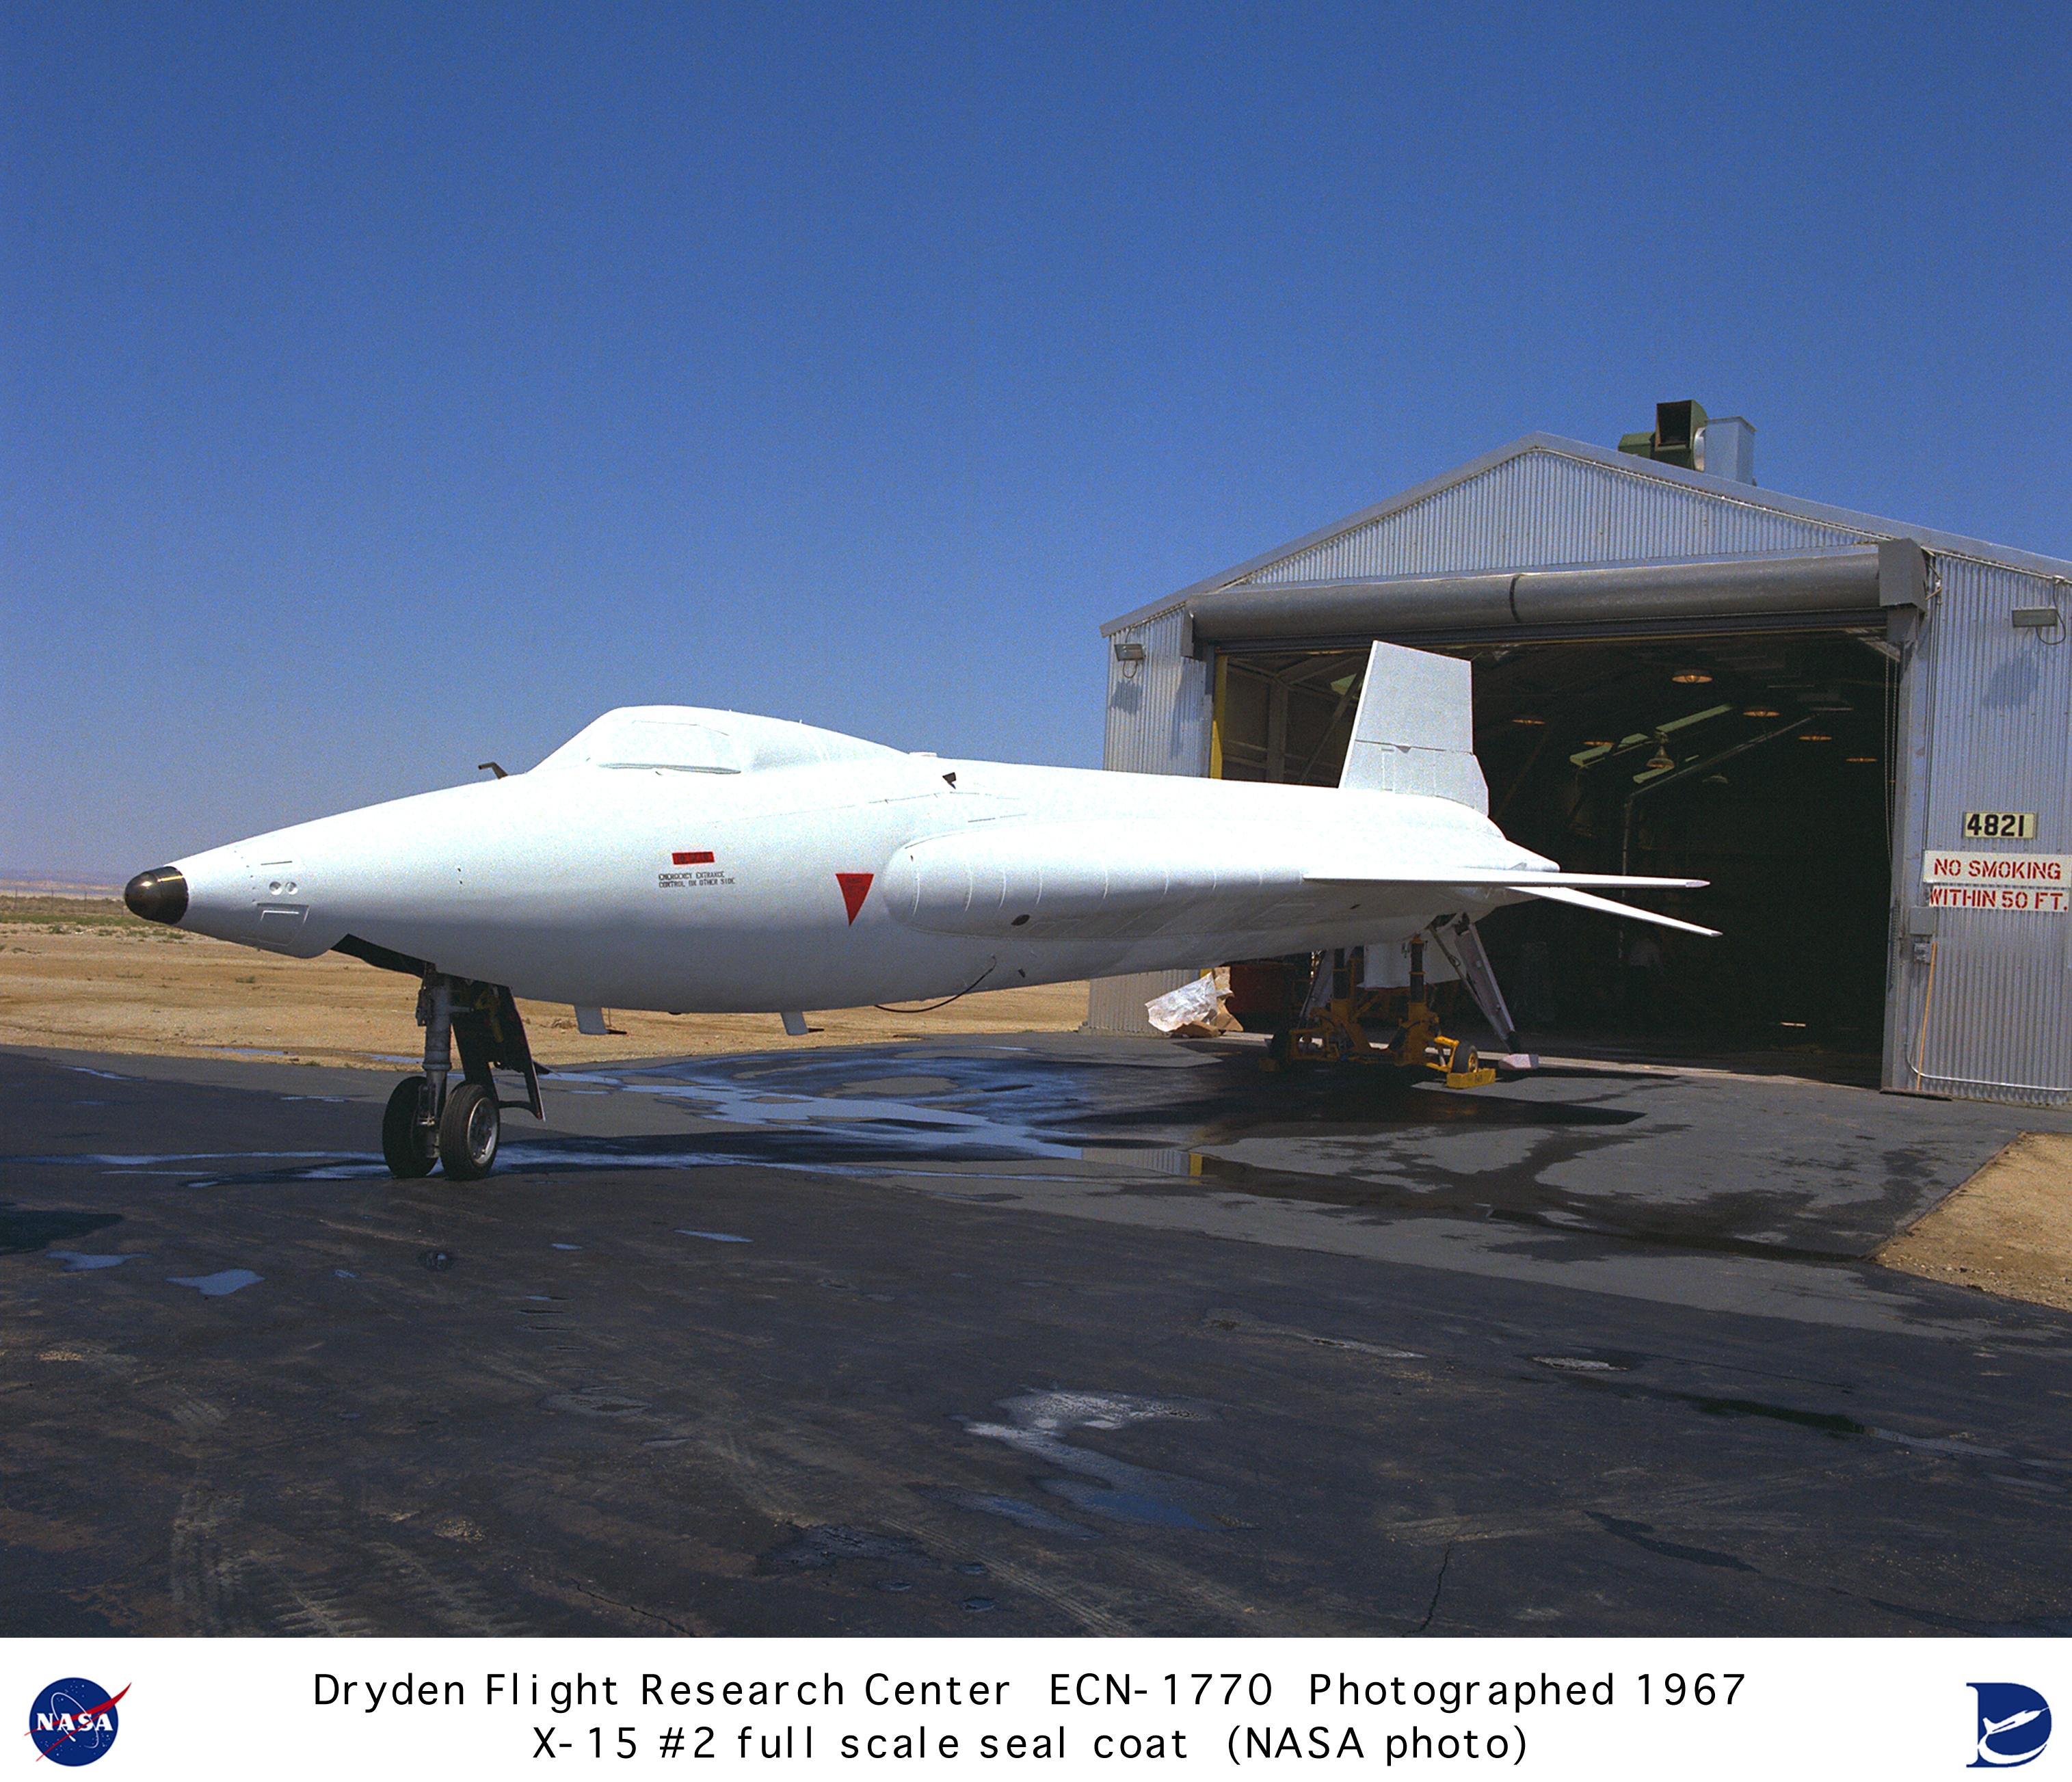 X-15 ECN-1770: X-15A-2 with ablative coating and sealant ...  X-15 ECN-1770: ...